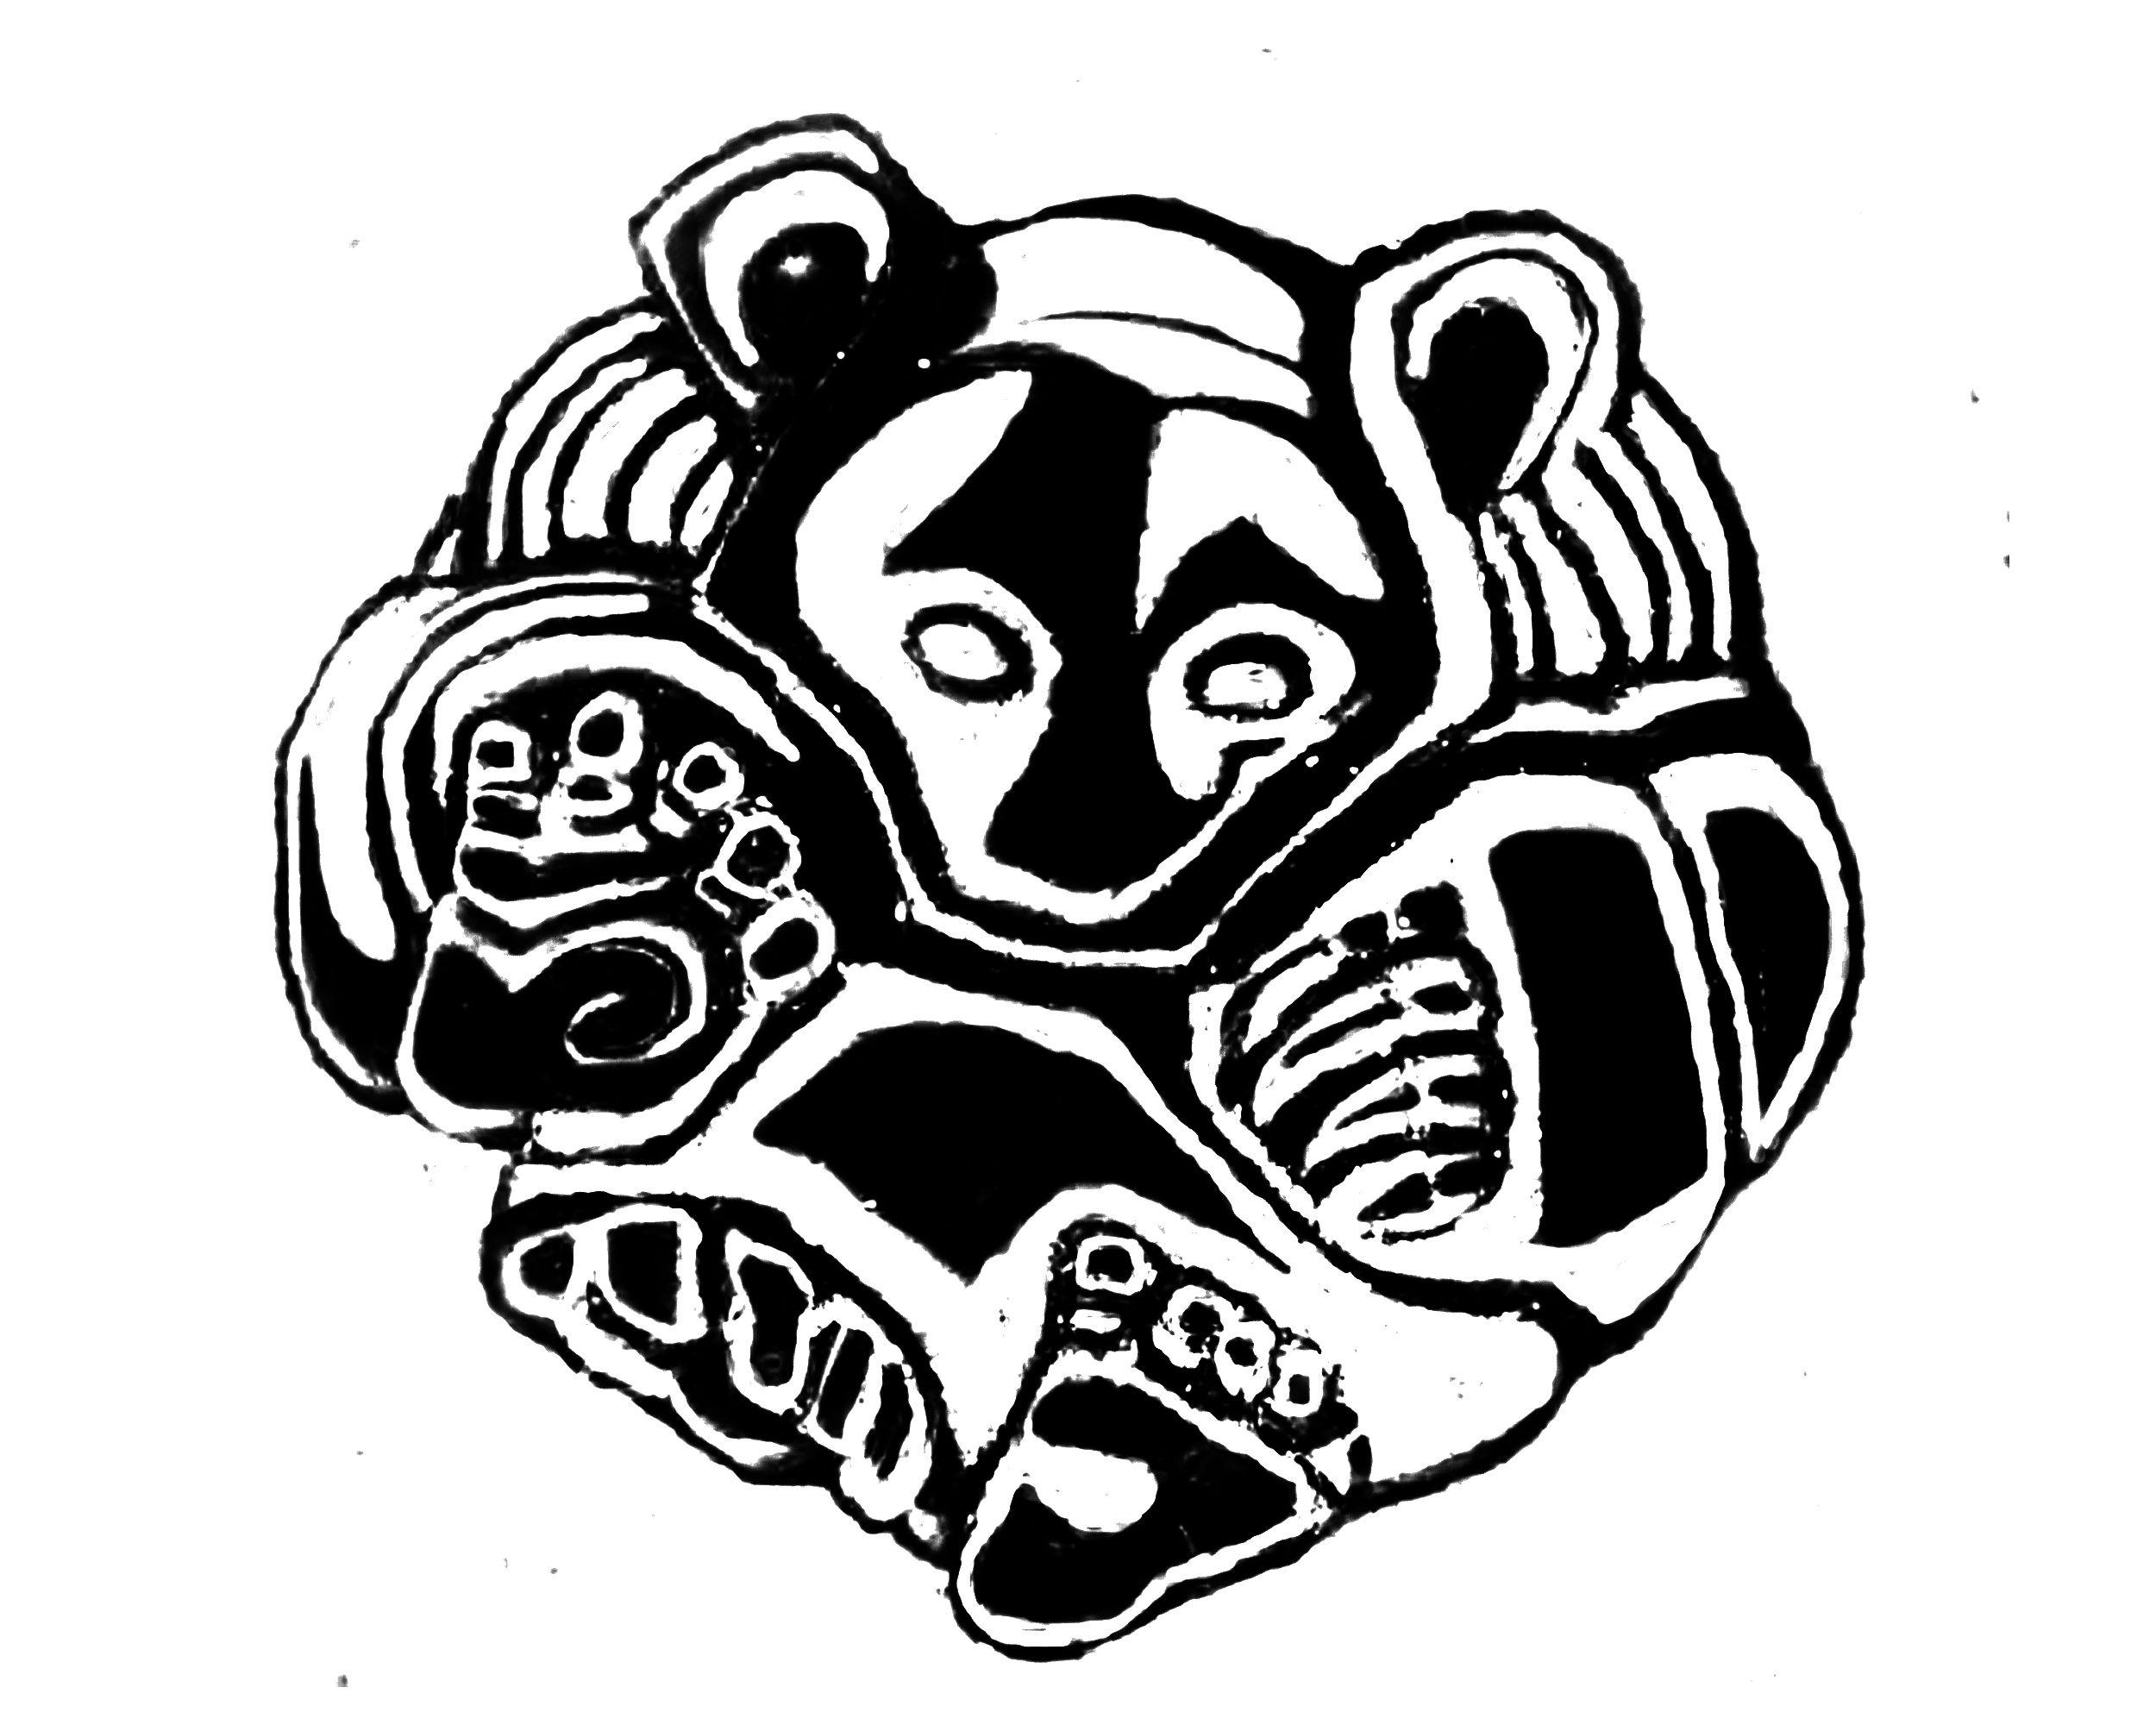 28 Scythian Tattoo Designs